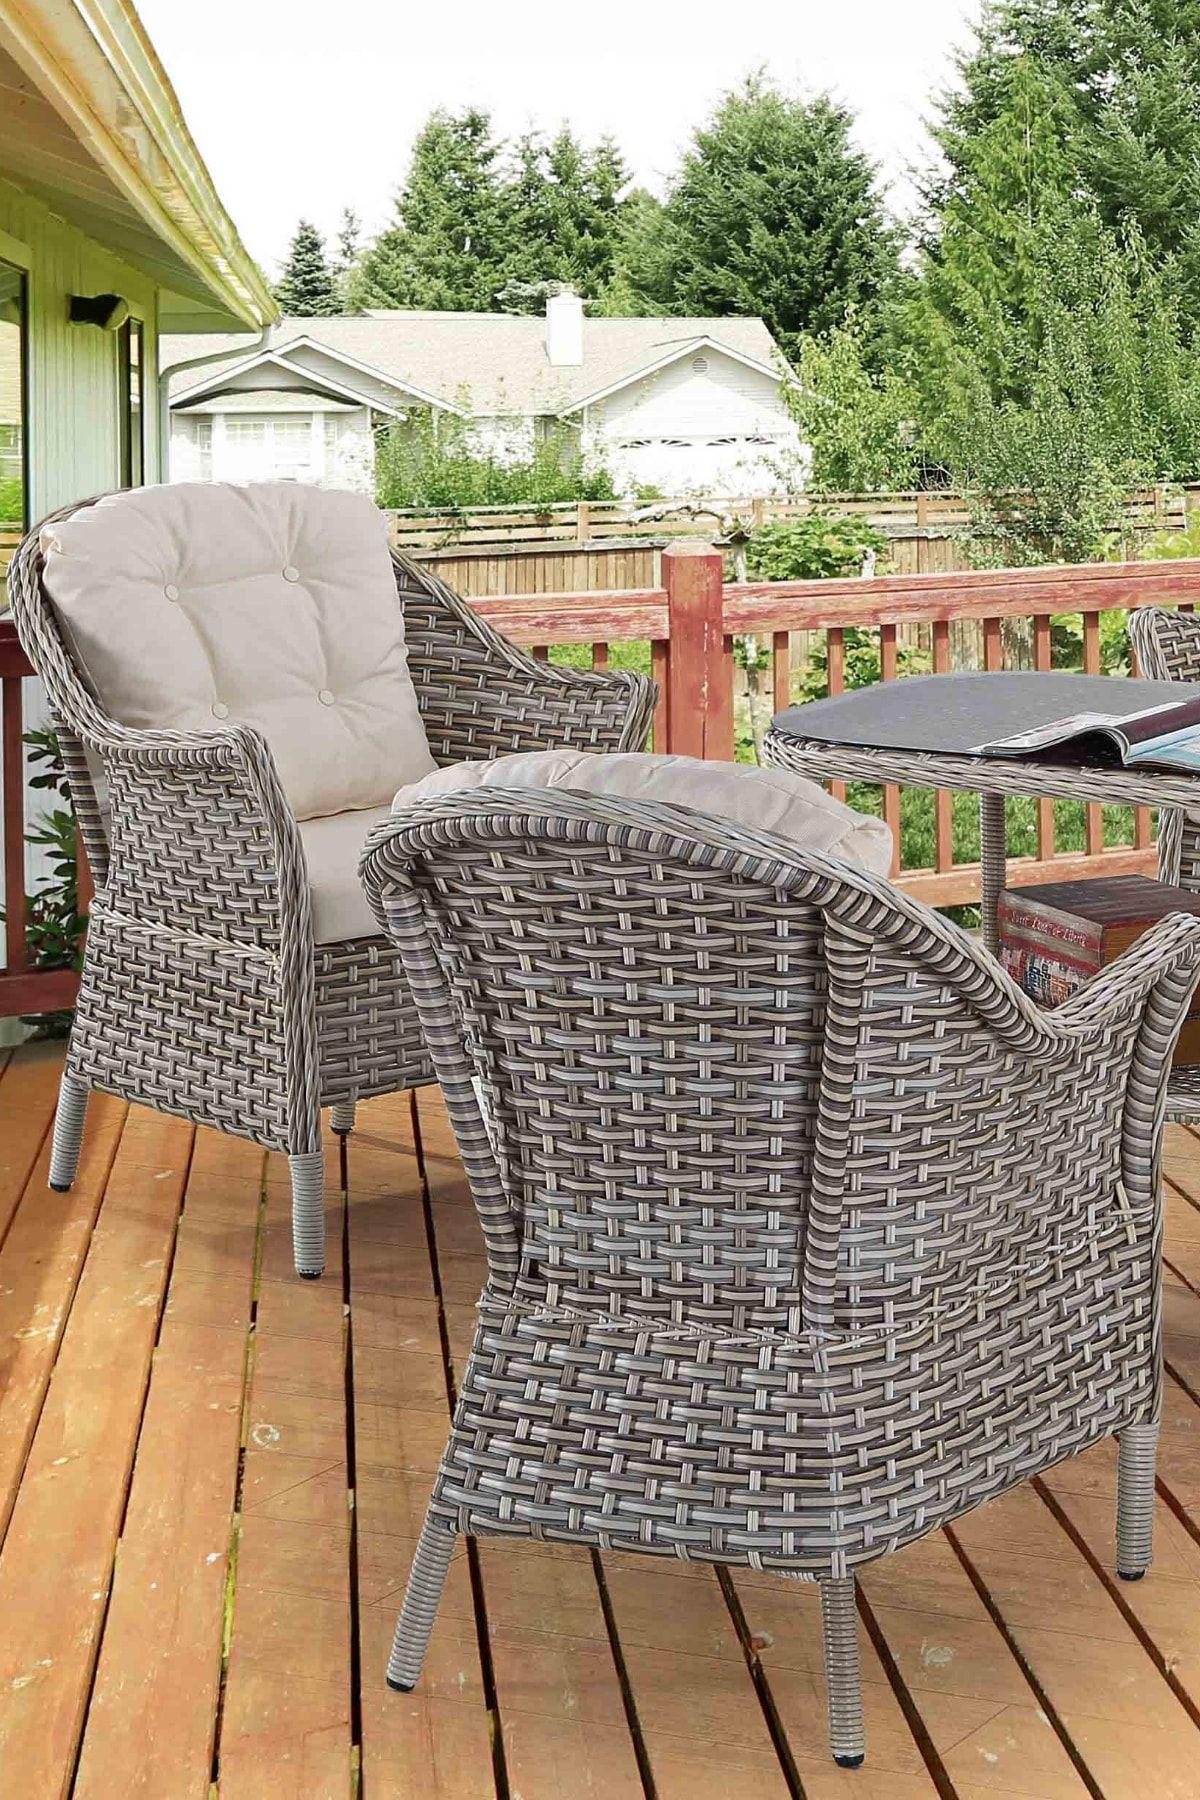 Vieno Home Garden Alba Orgu Rattan Bahce Balkon Ikili Koltuk Masa 4 Parca Keyif Seti Trendyol 2020 Dis Mekan Mobilyalari Koltuklar Bahce